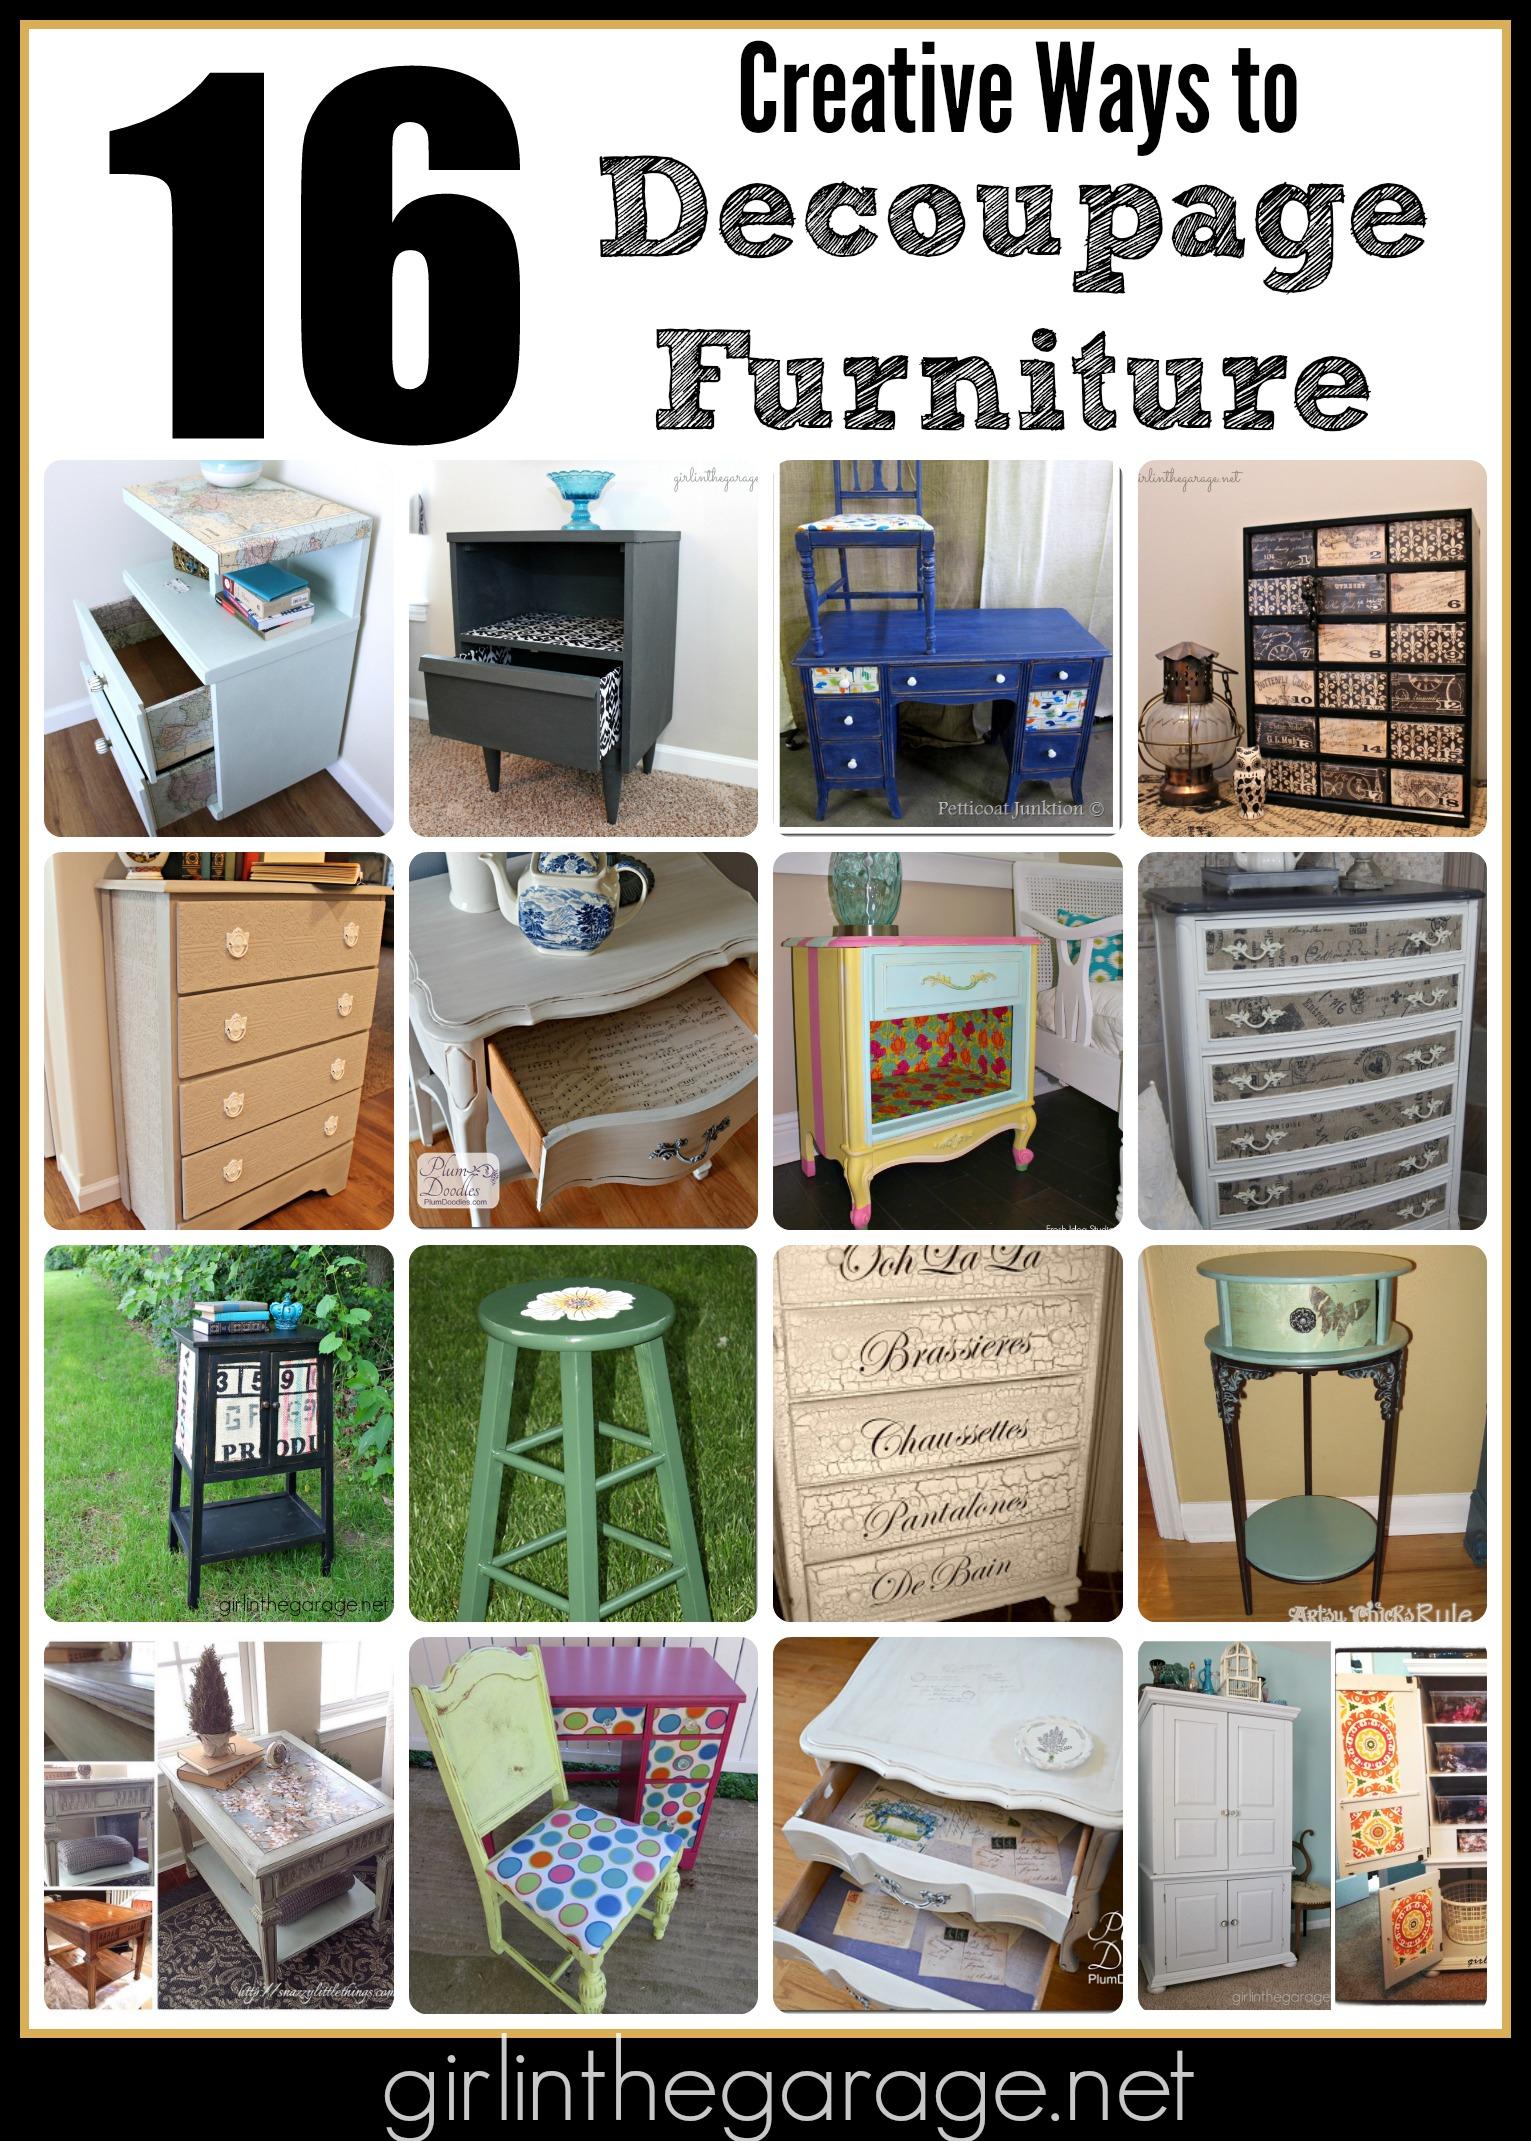 16 Creative Ways to Decoupage Furniture  Girl in the Garage